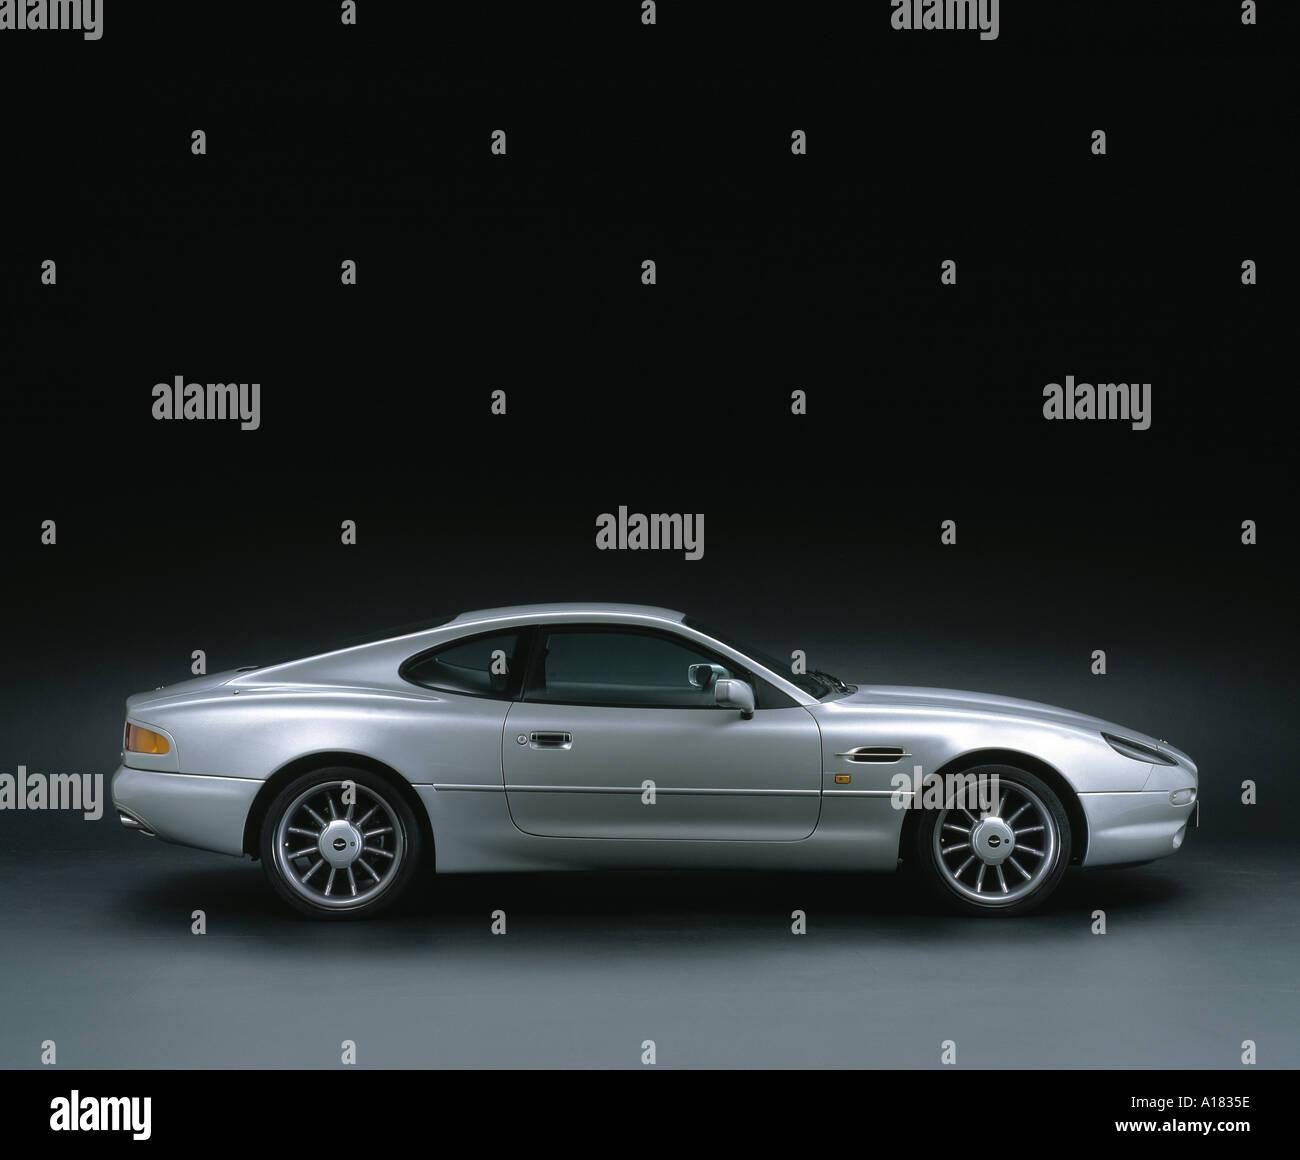 1999 Aston Martin DB7 Dunhill Stockbild